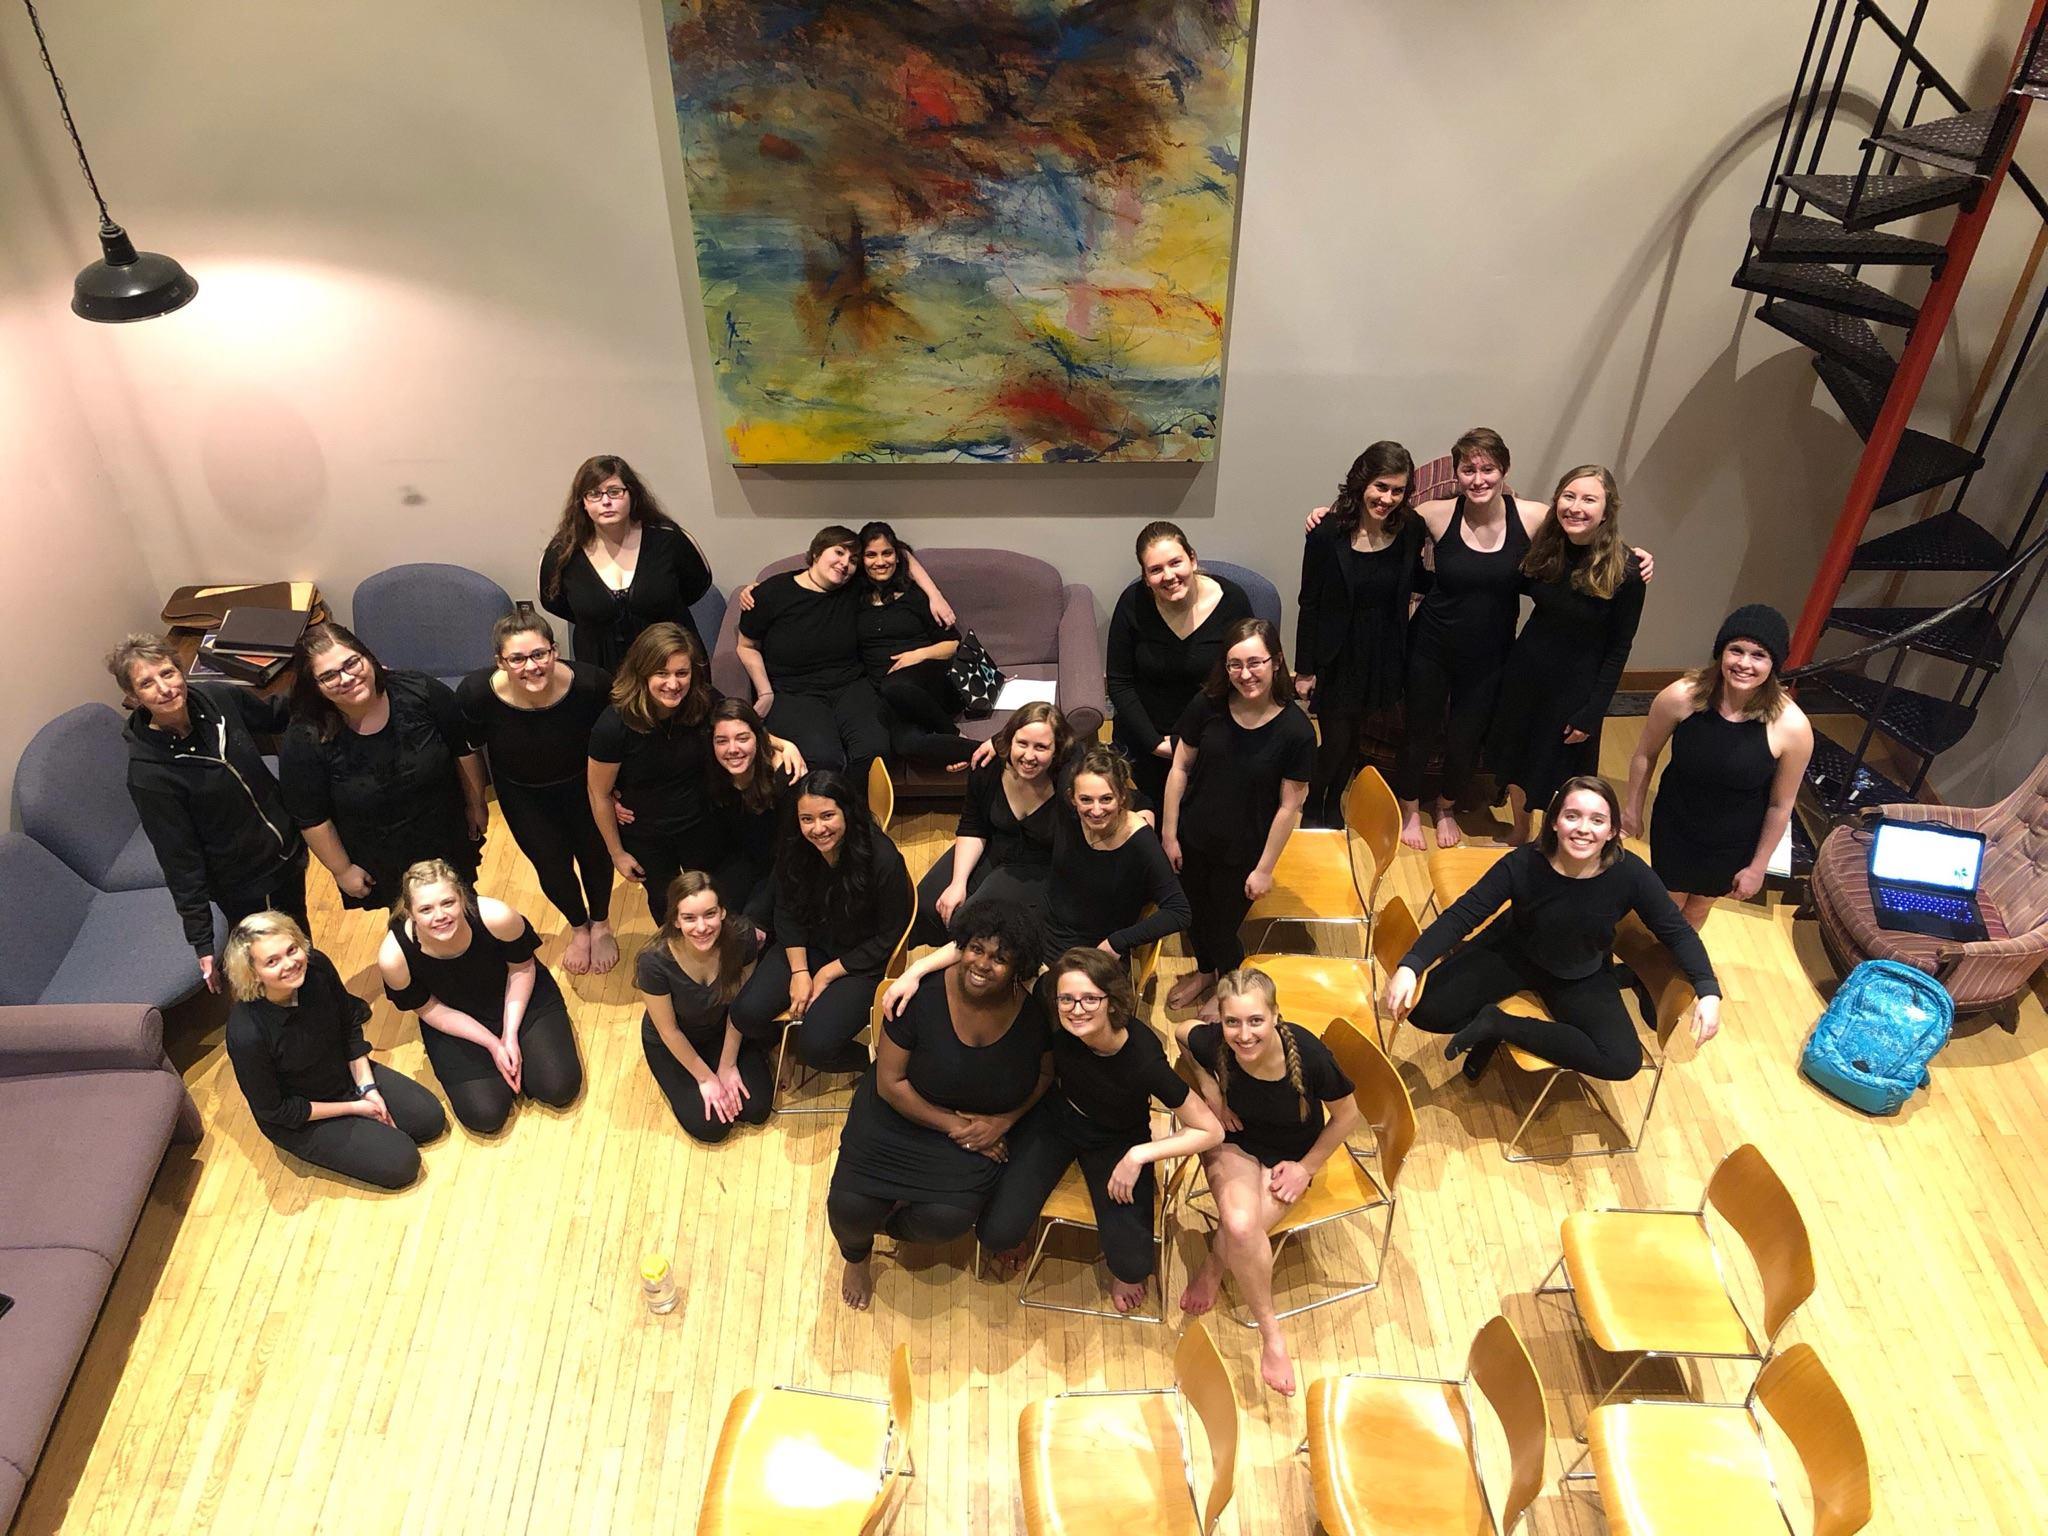 Goshen Monologues 2019 group photo